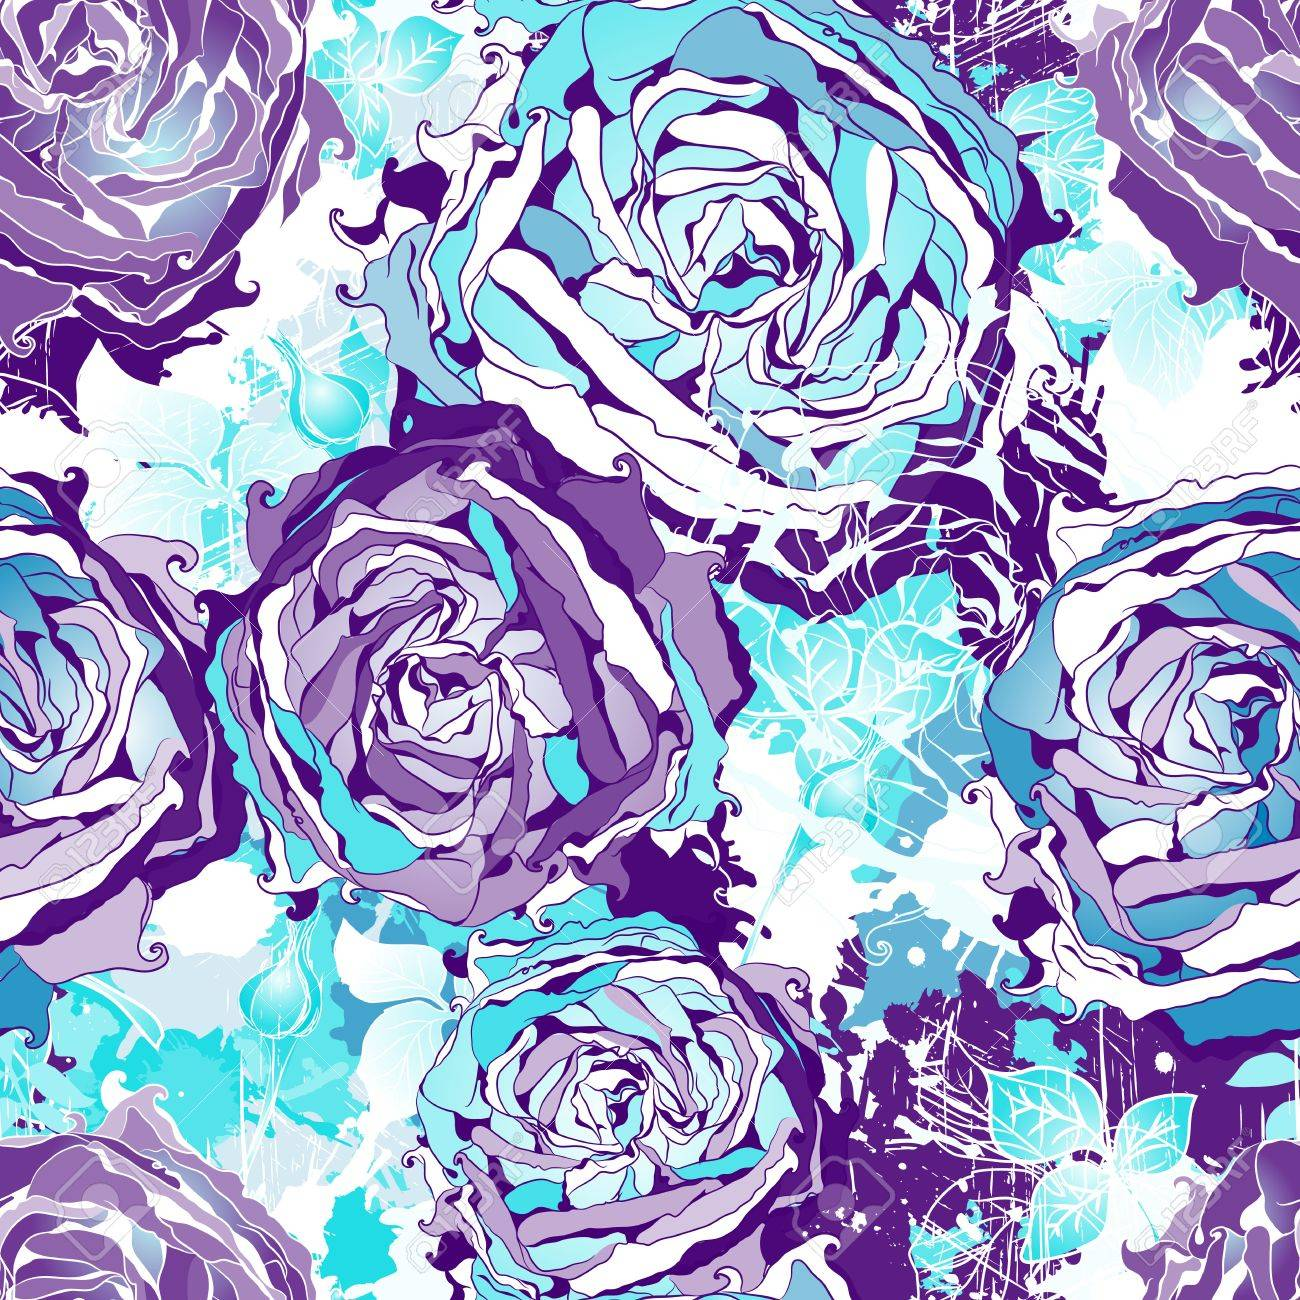 Seamless flowers wallpaper pattern. - 42098839